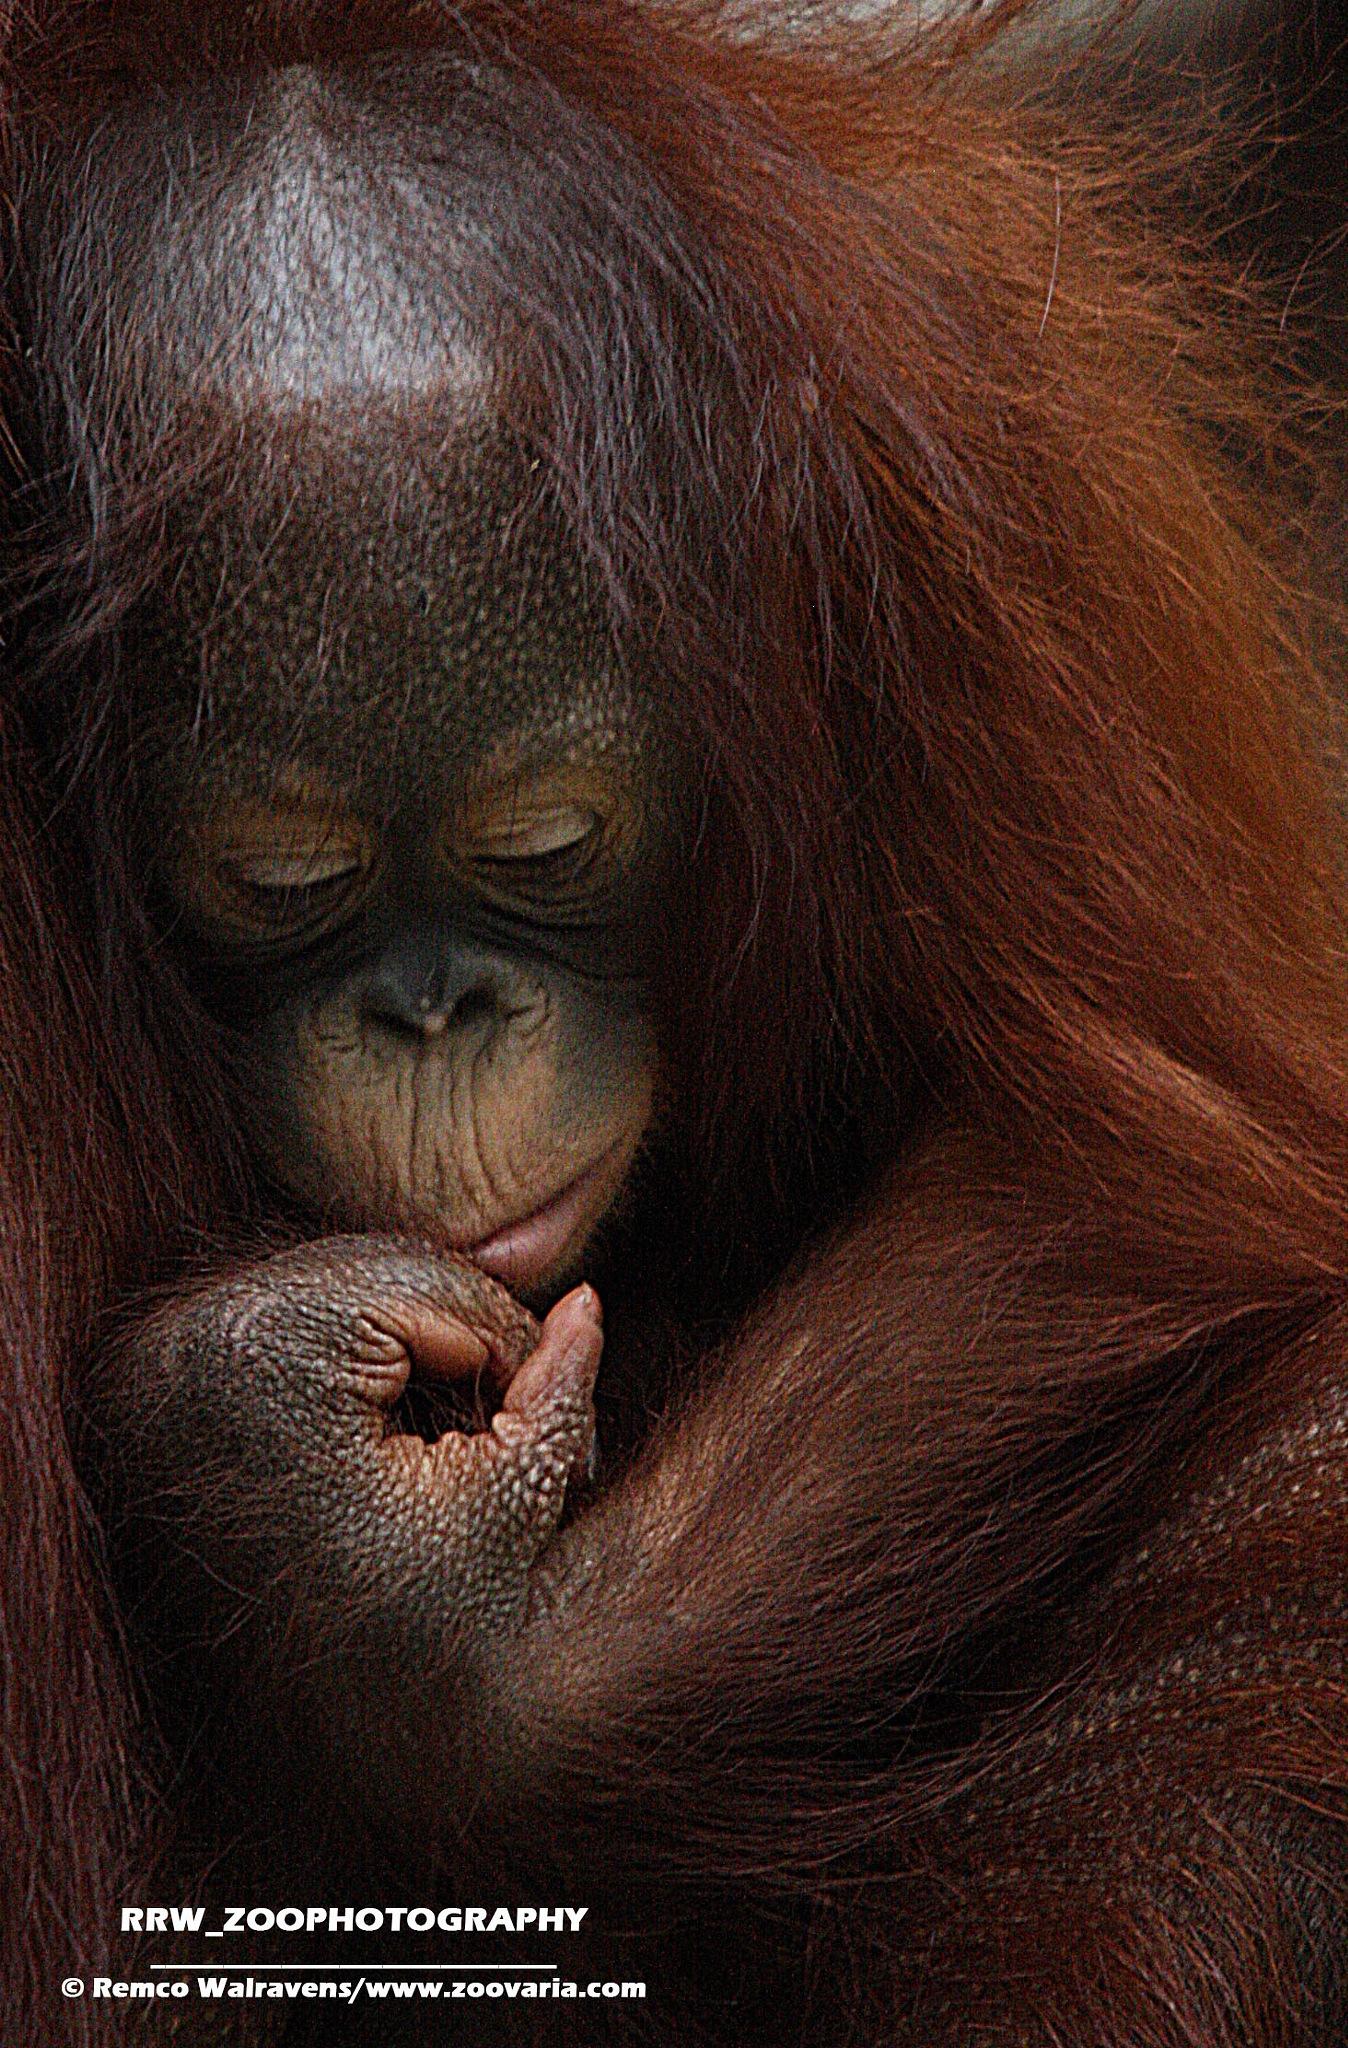 Baby orangutan asleep by Remco Walravens